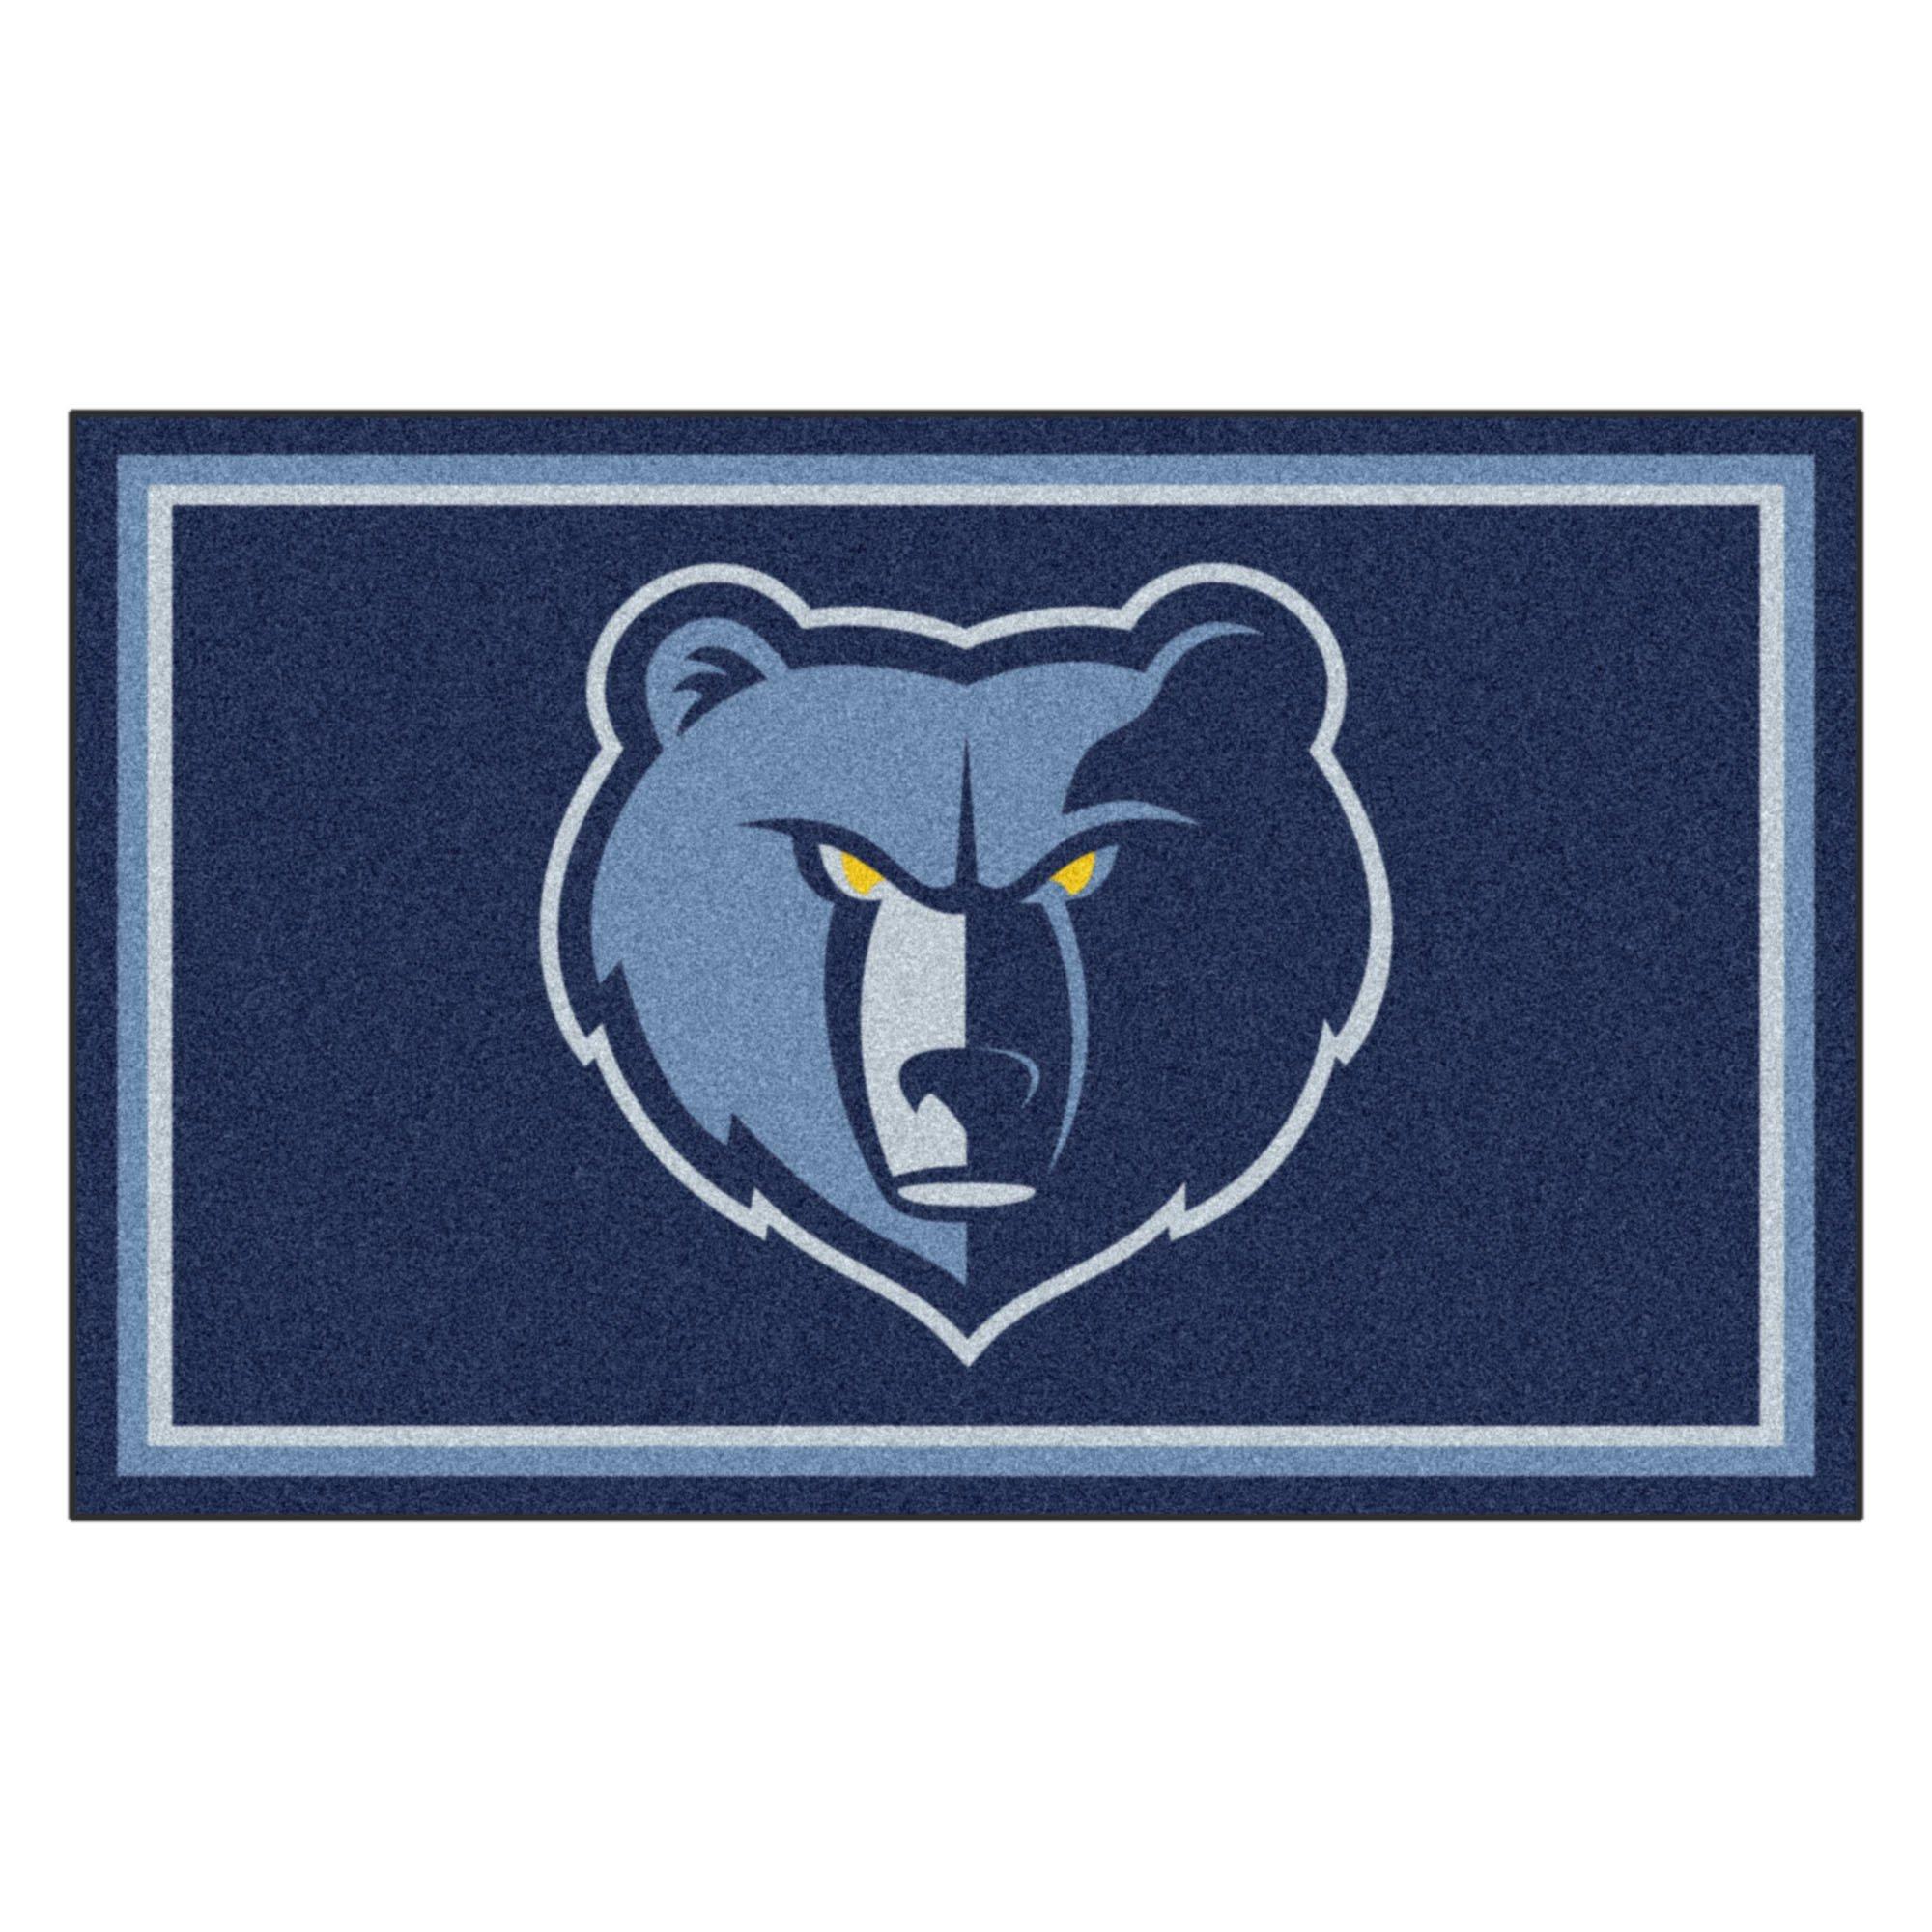 FANMATS 20432 Team Color 44''x71'' NBA - Memphis Grizzlies Rug